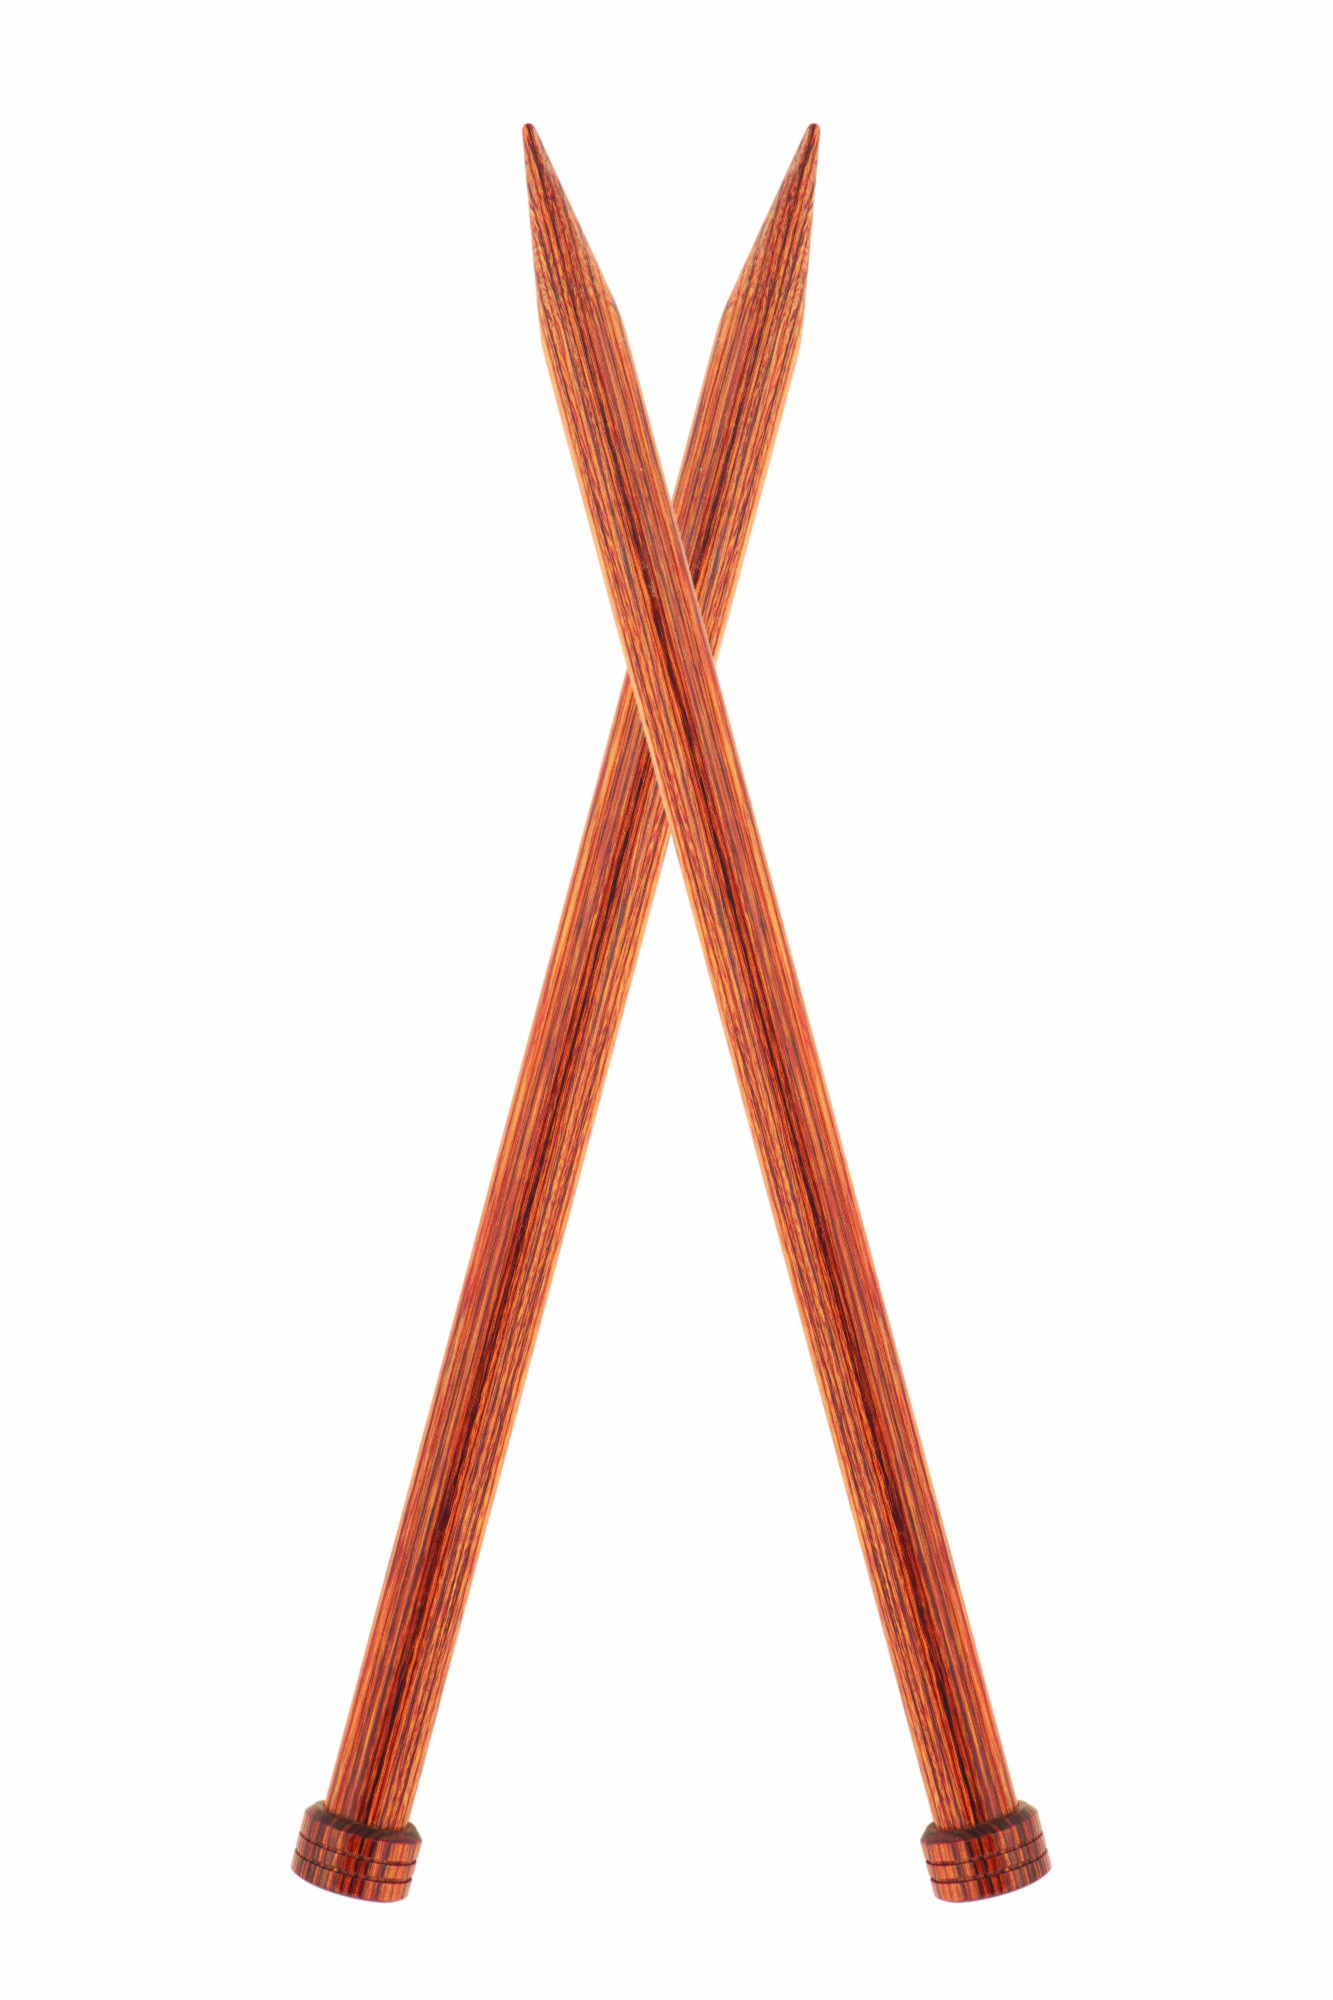 31167 Спицы прямые 5.00 мм - 30 см Ginger KnitPro